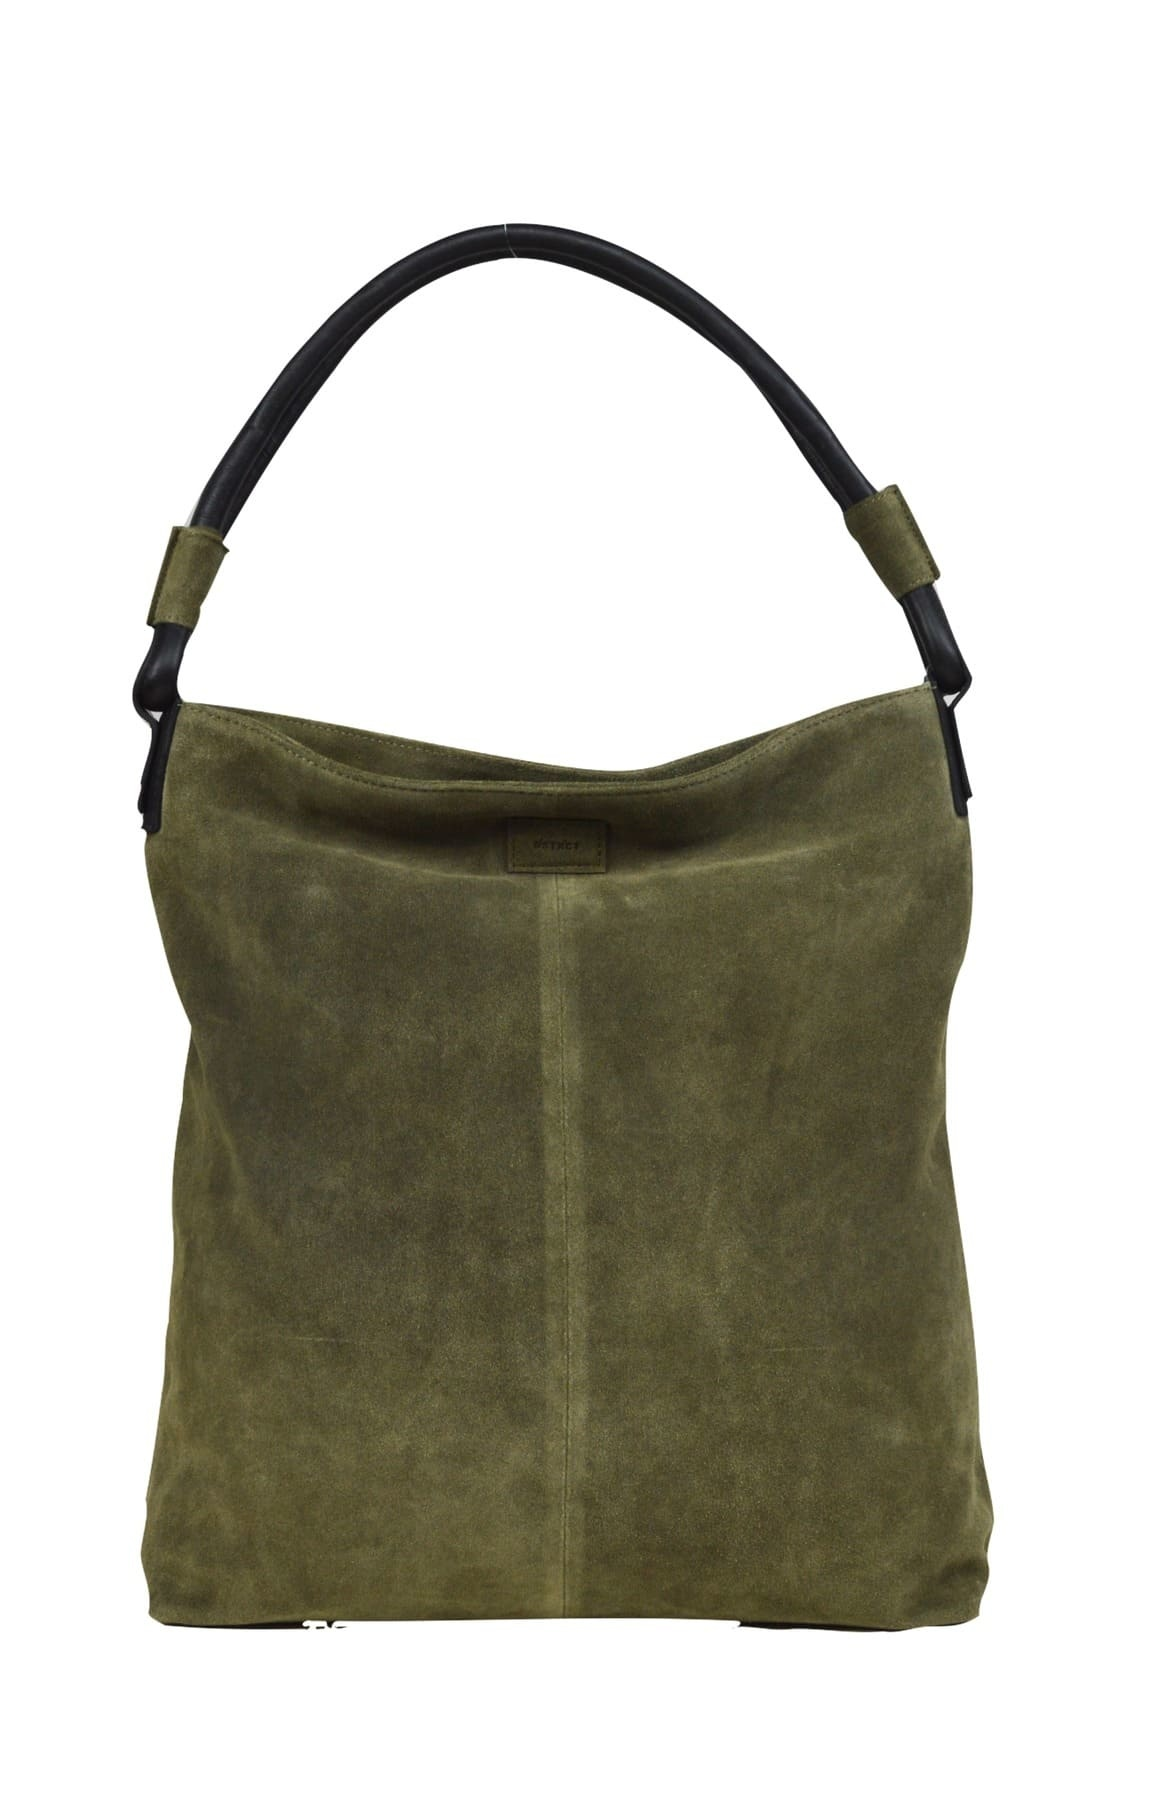 DSTRCT Portland Road Hobo Bag Khaki